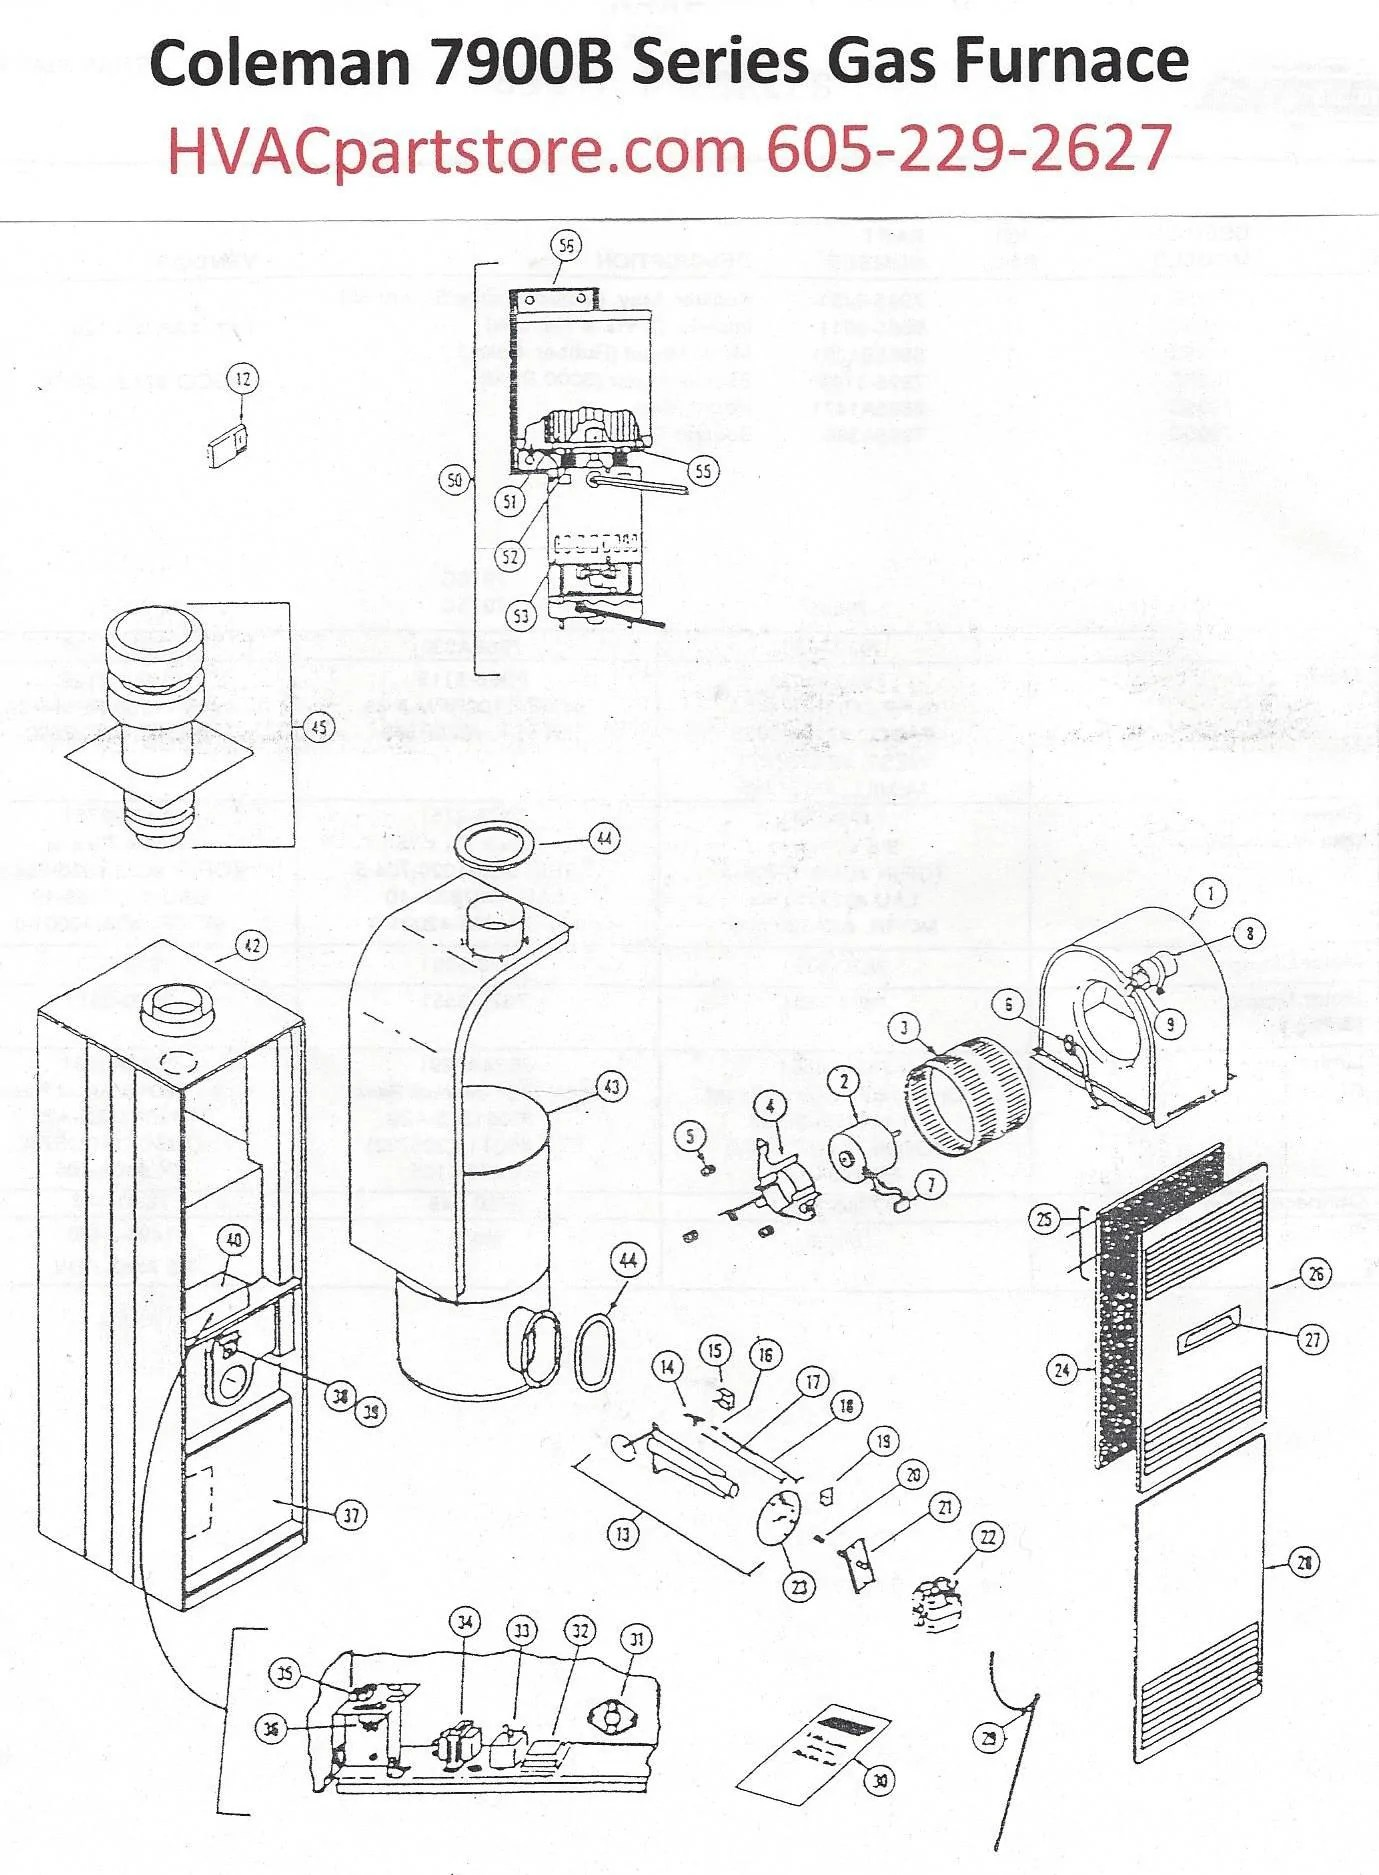 7966B856 Coleman Gas Furnace Parts – HVACpartstore